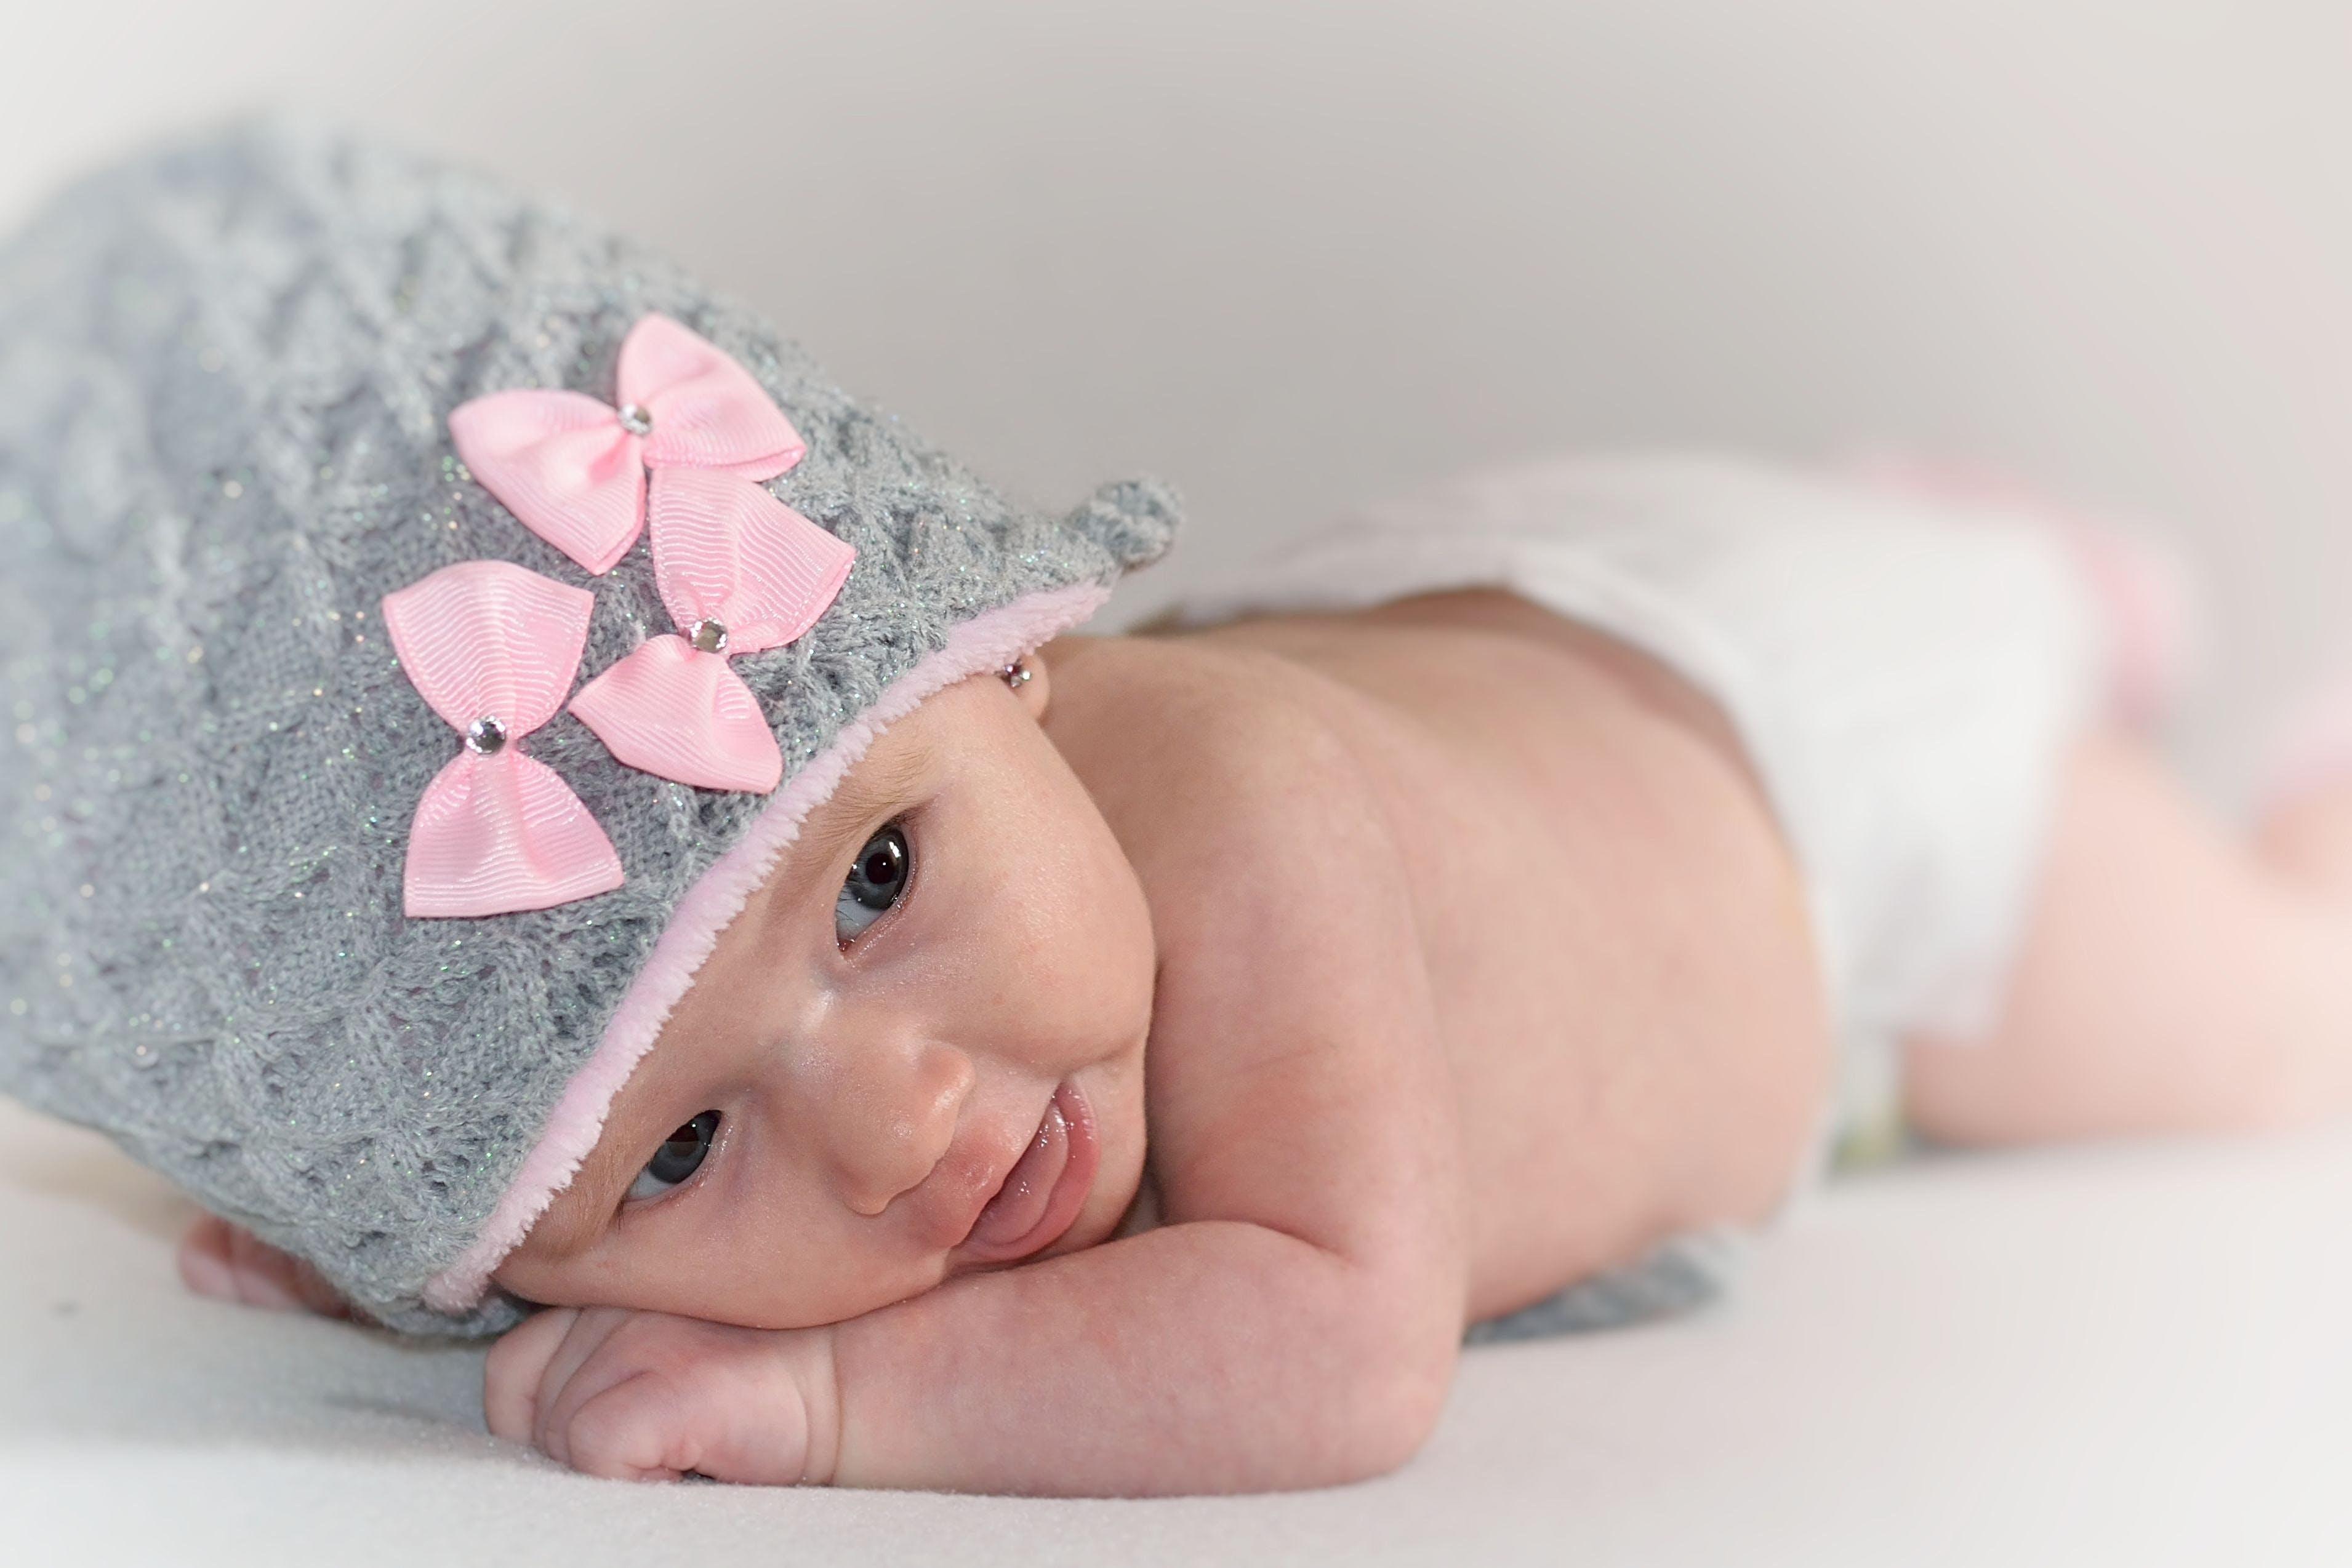 adorable, baby, baby girl